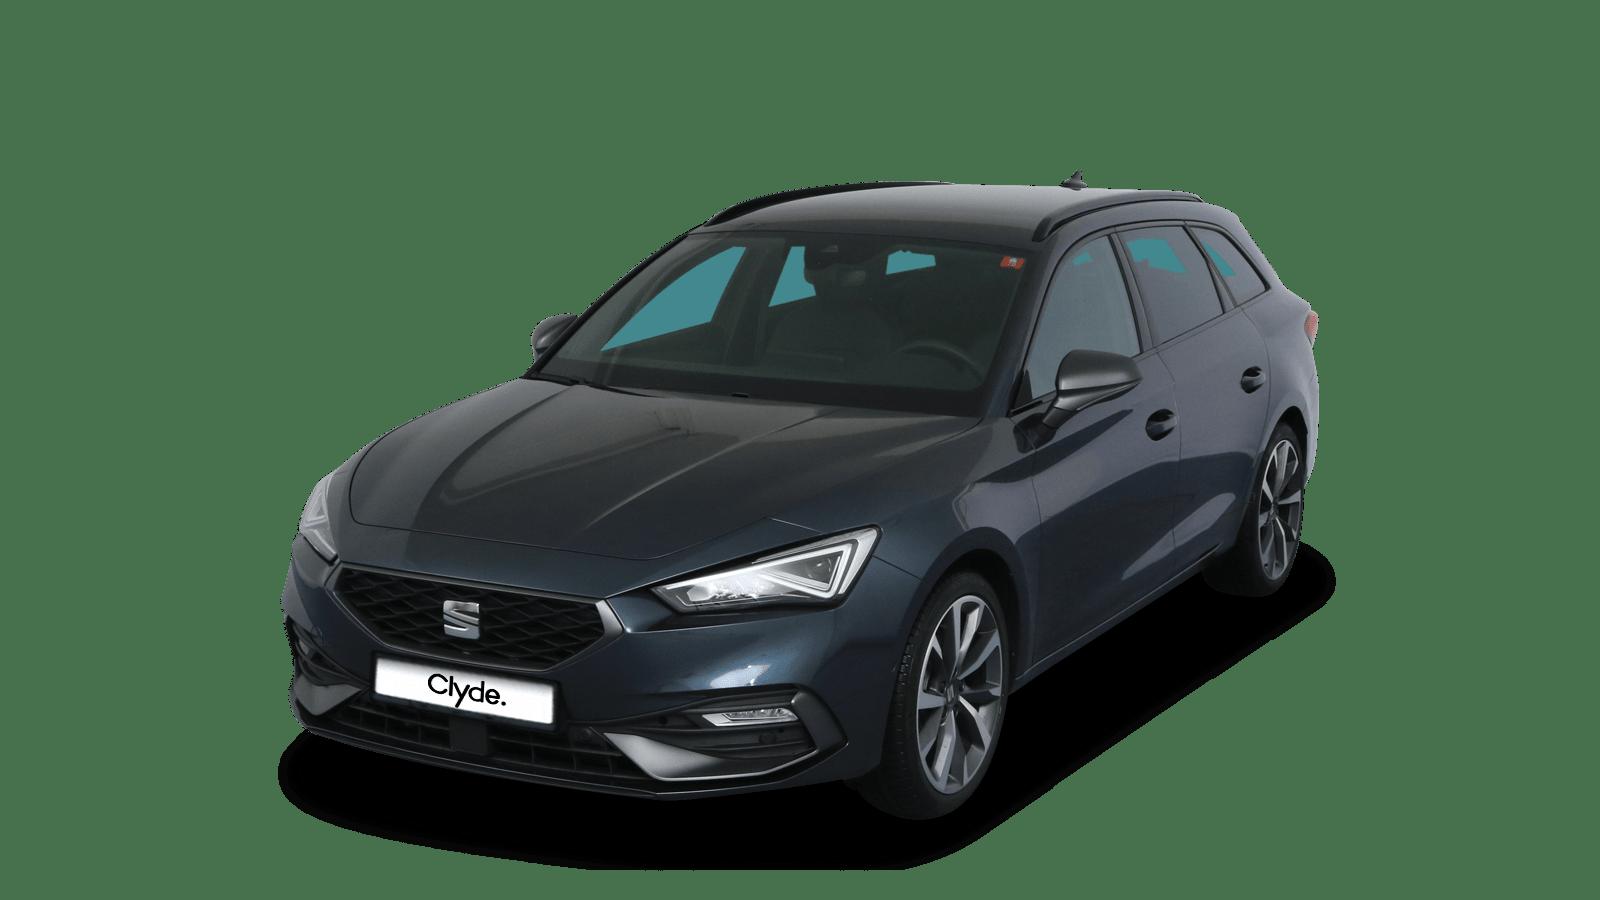 SEAT Leon Sportstourer Grau front - Clyde Auto-Abo